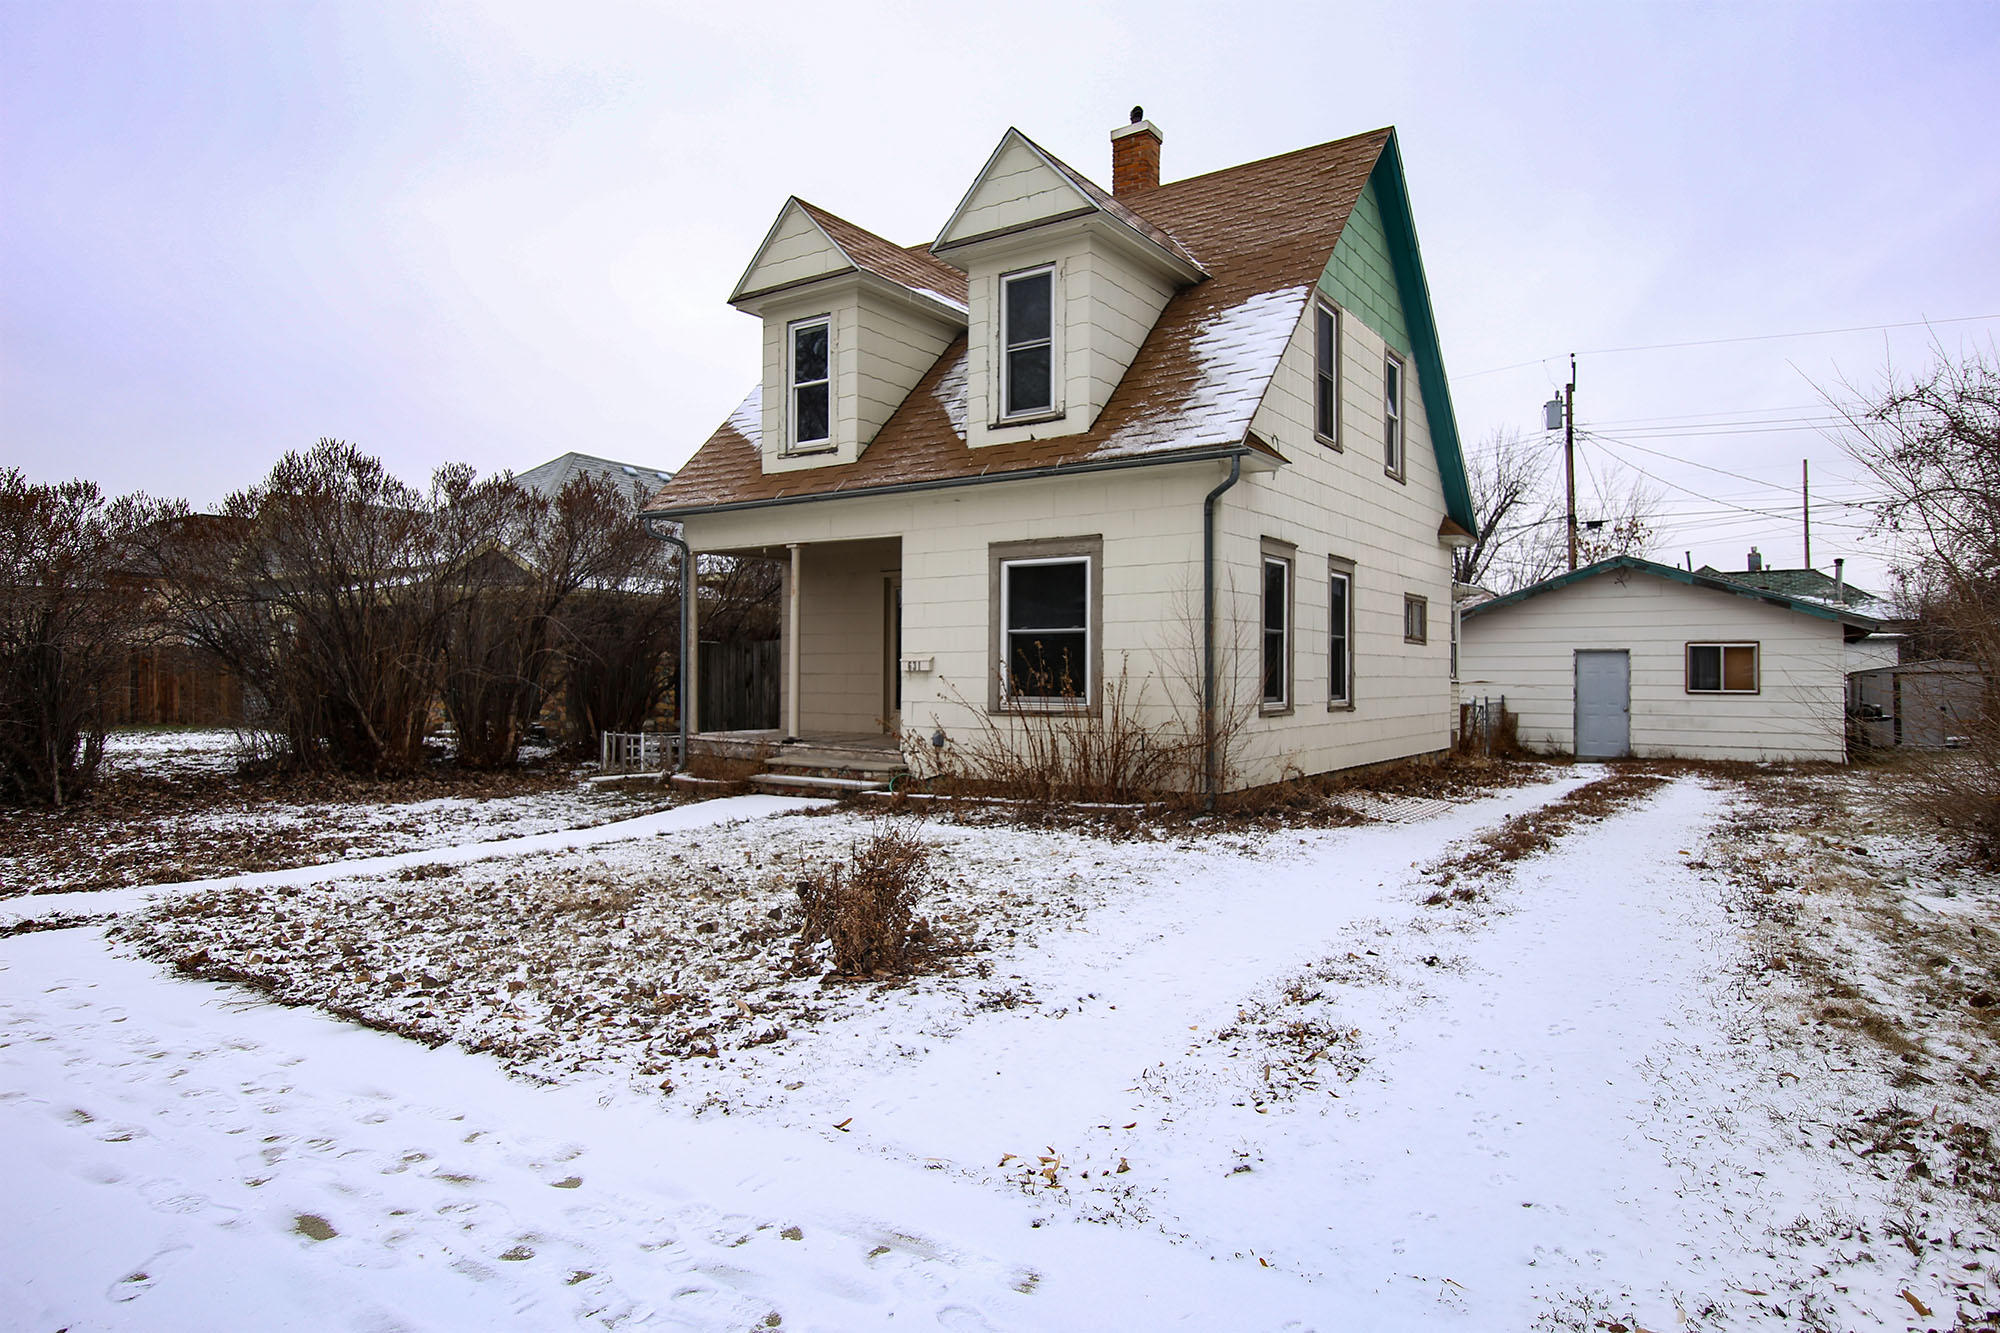 631 N Gould Street, Sheridan, Wyoming 82801, 2 Bedrooms Bedrooms, ,1 BathroomBathrooms,Residential,For Sale,Gould,19-5